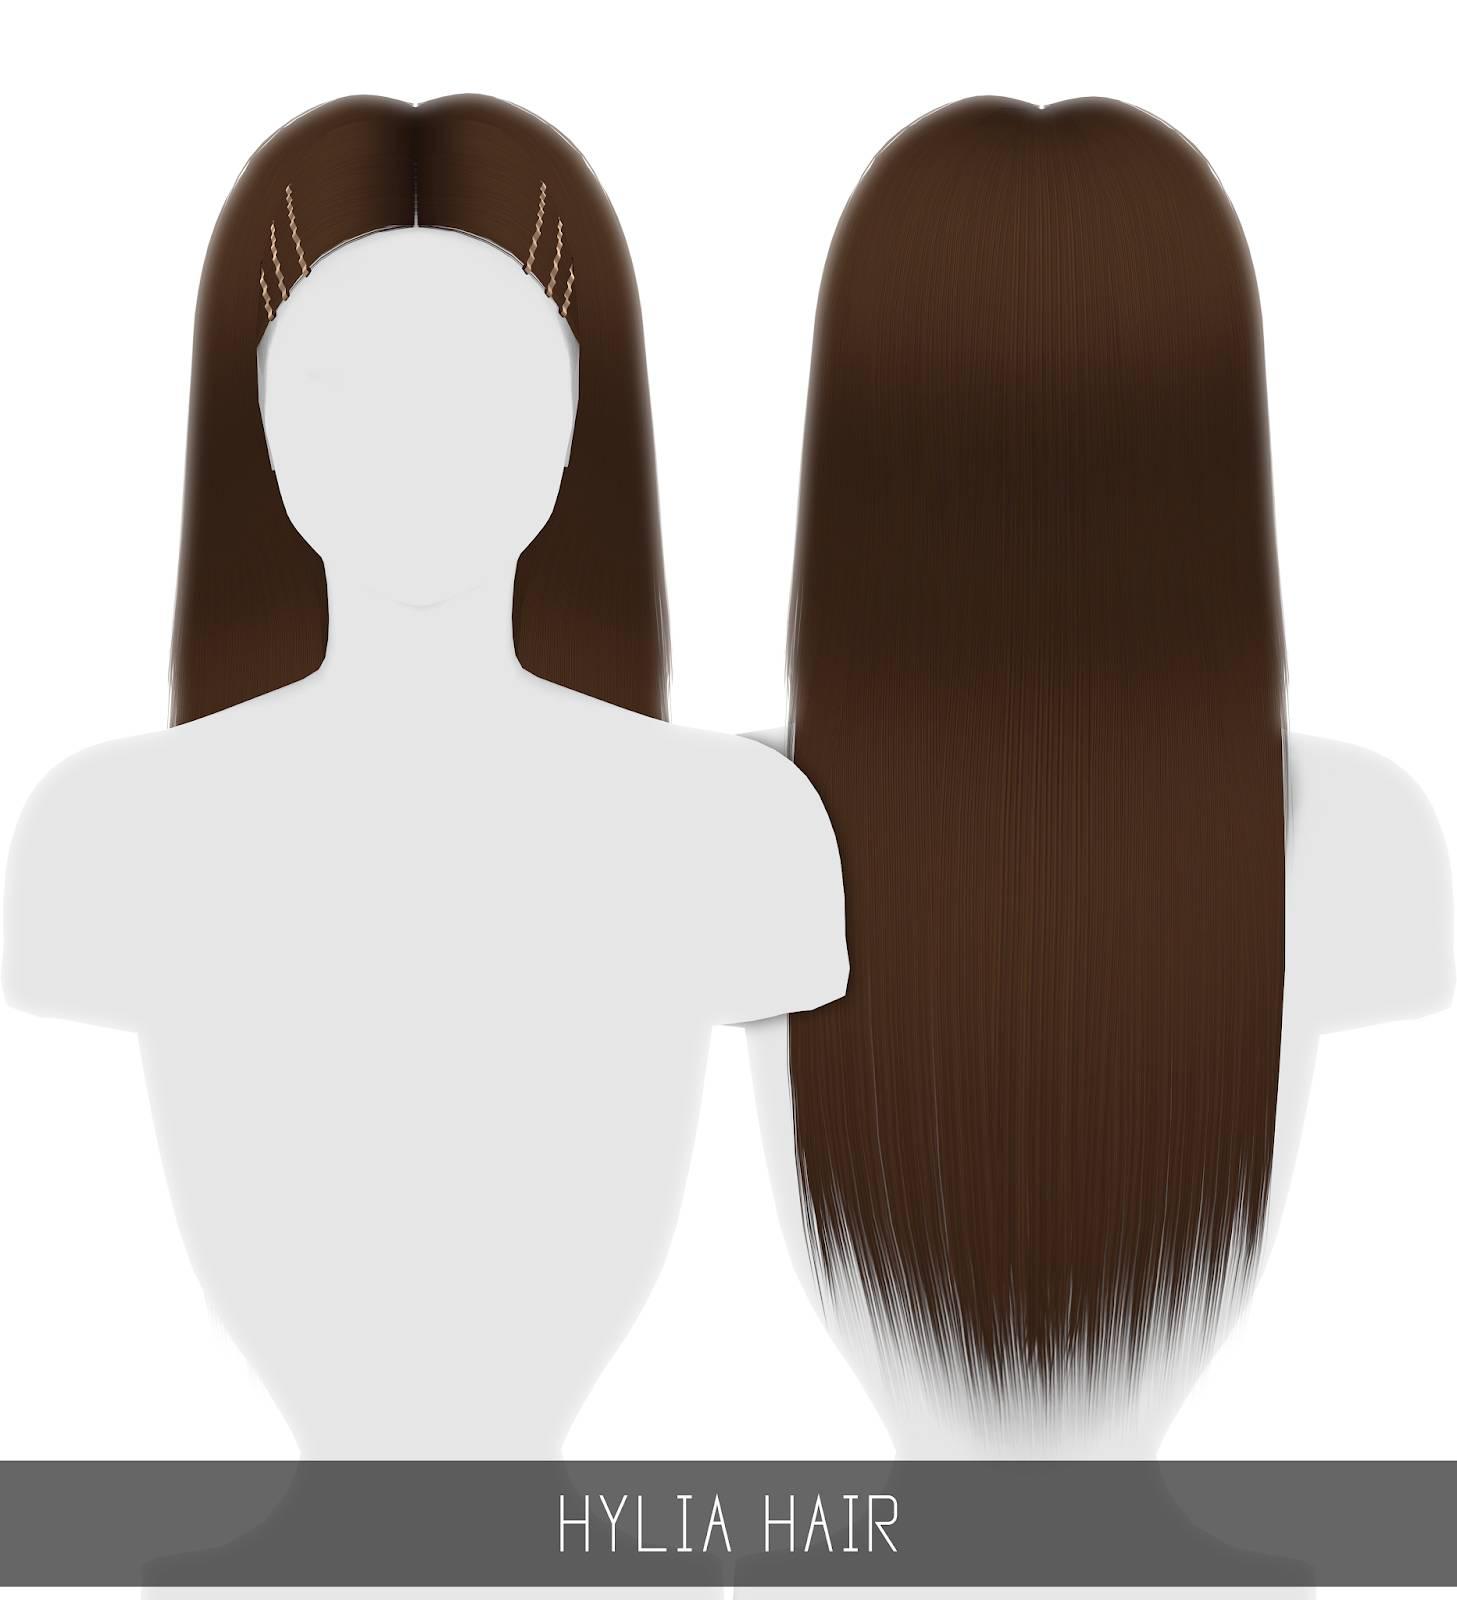 Прическа - HYLIA HAIR